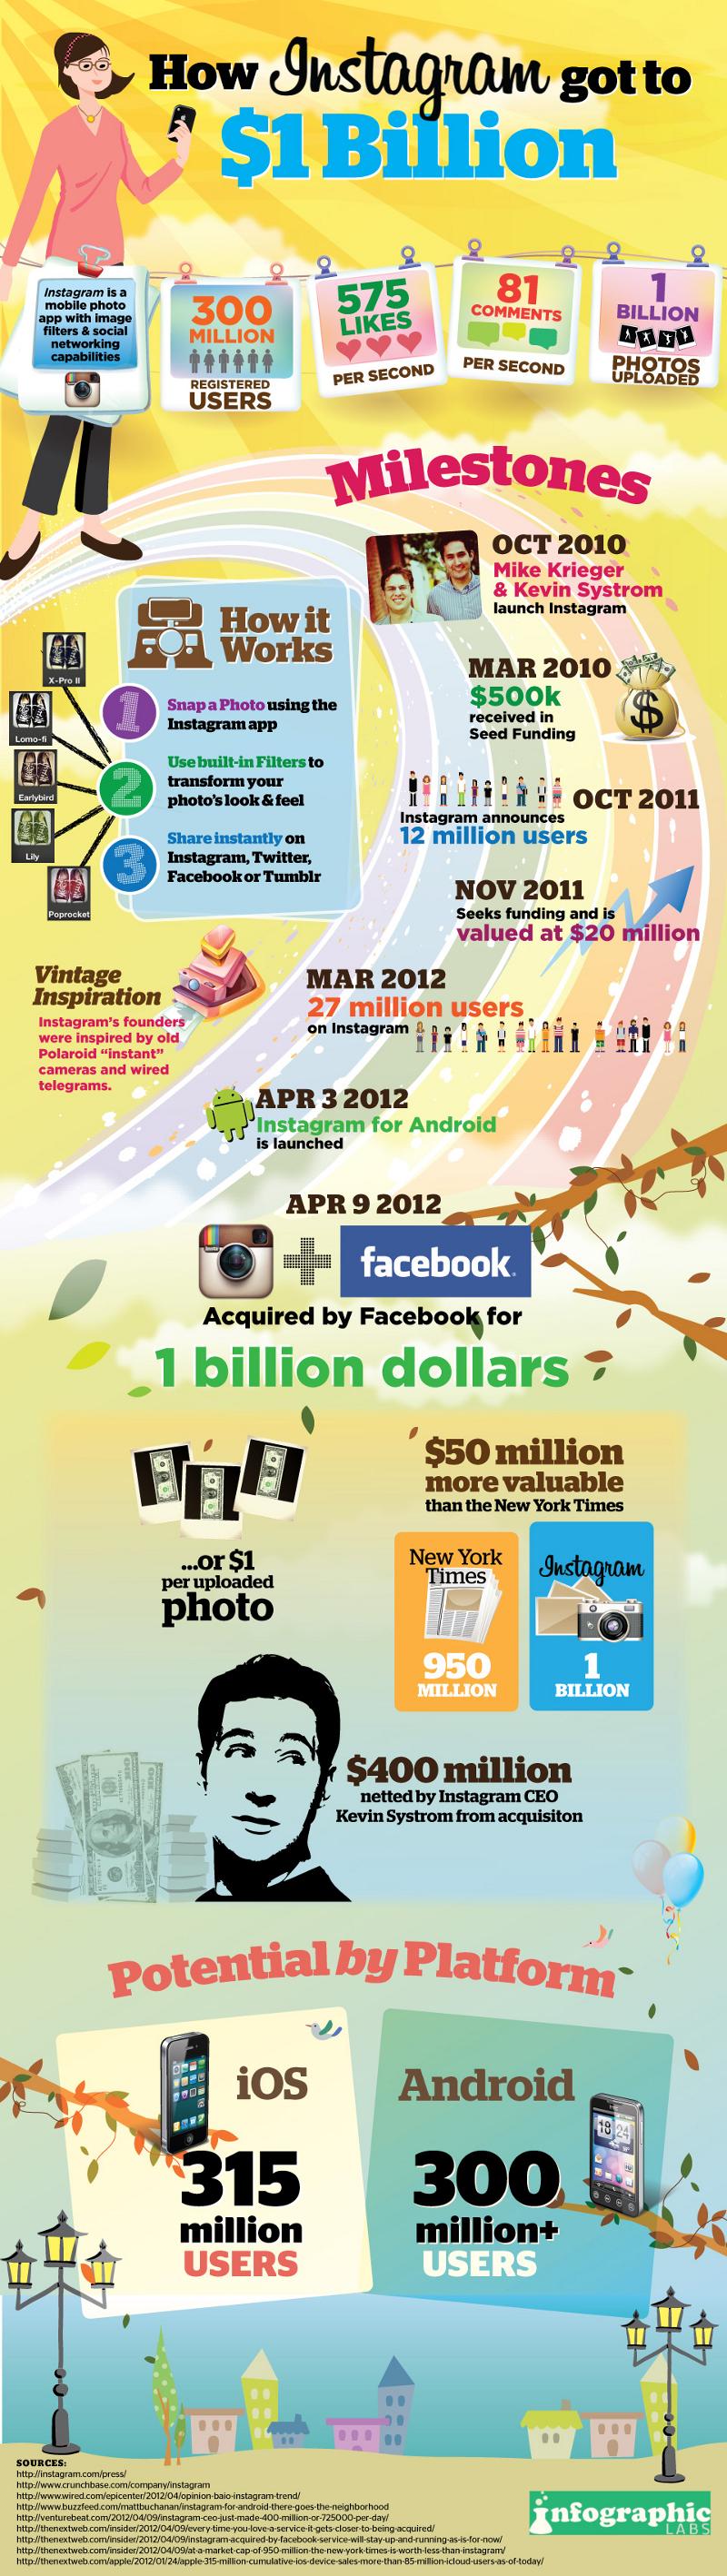 Instagram Statistics and Company Timeline